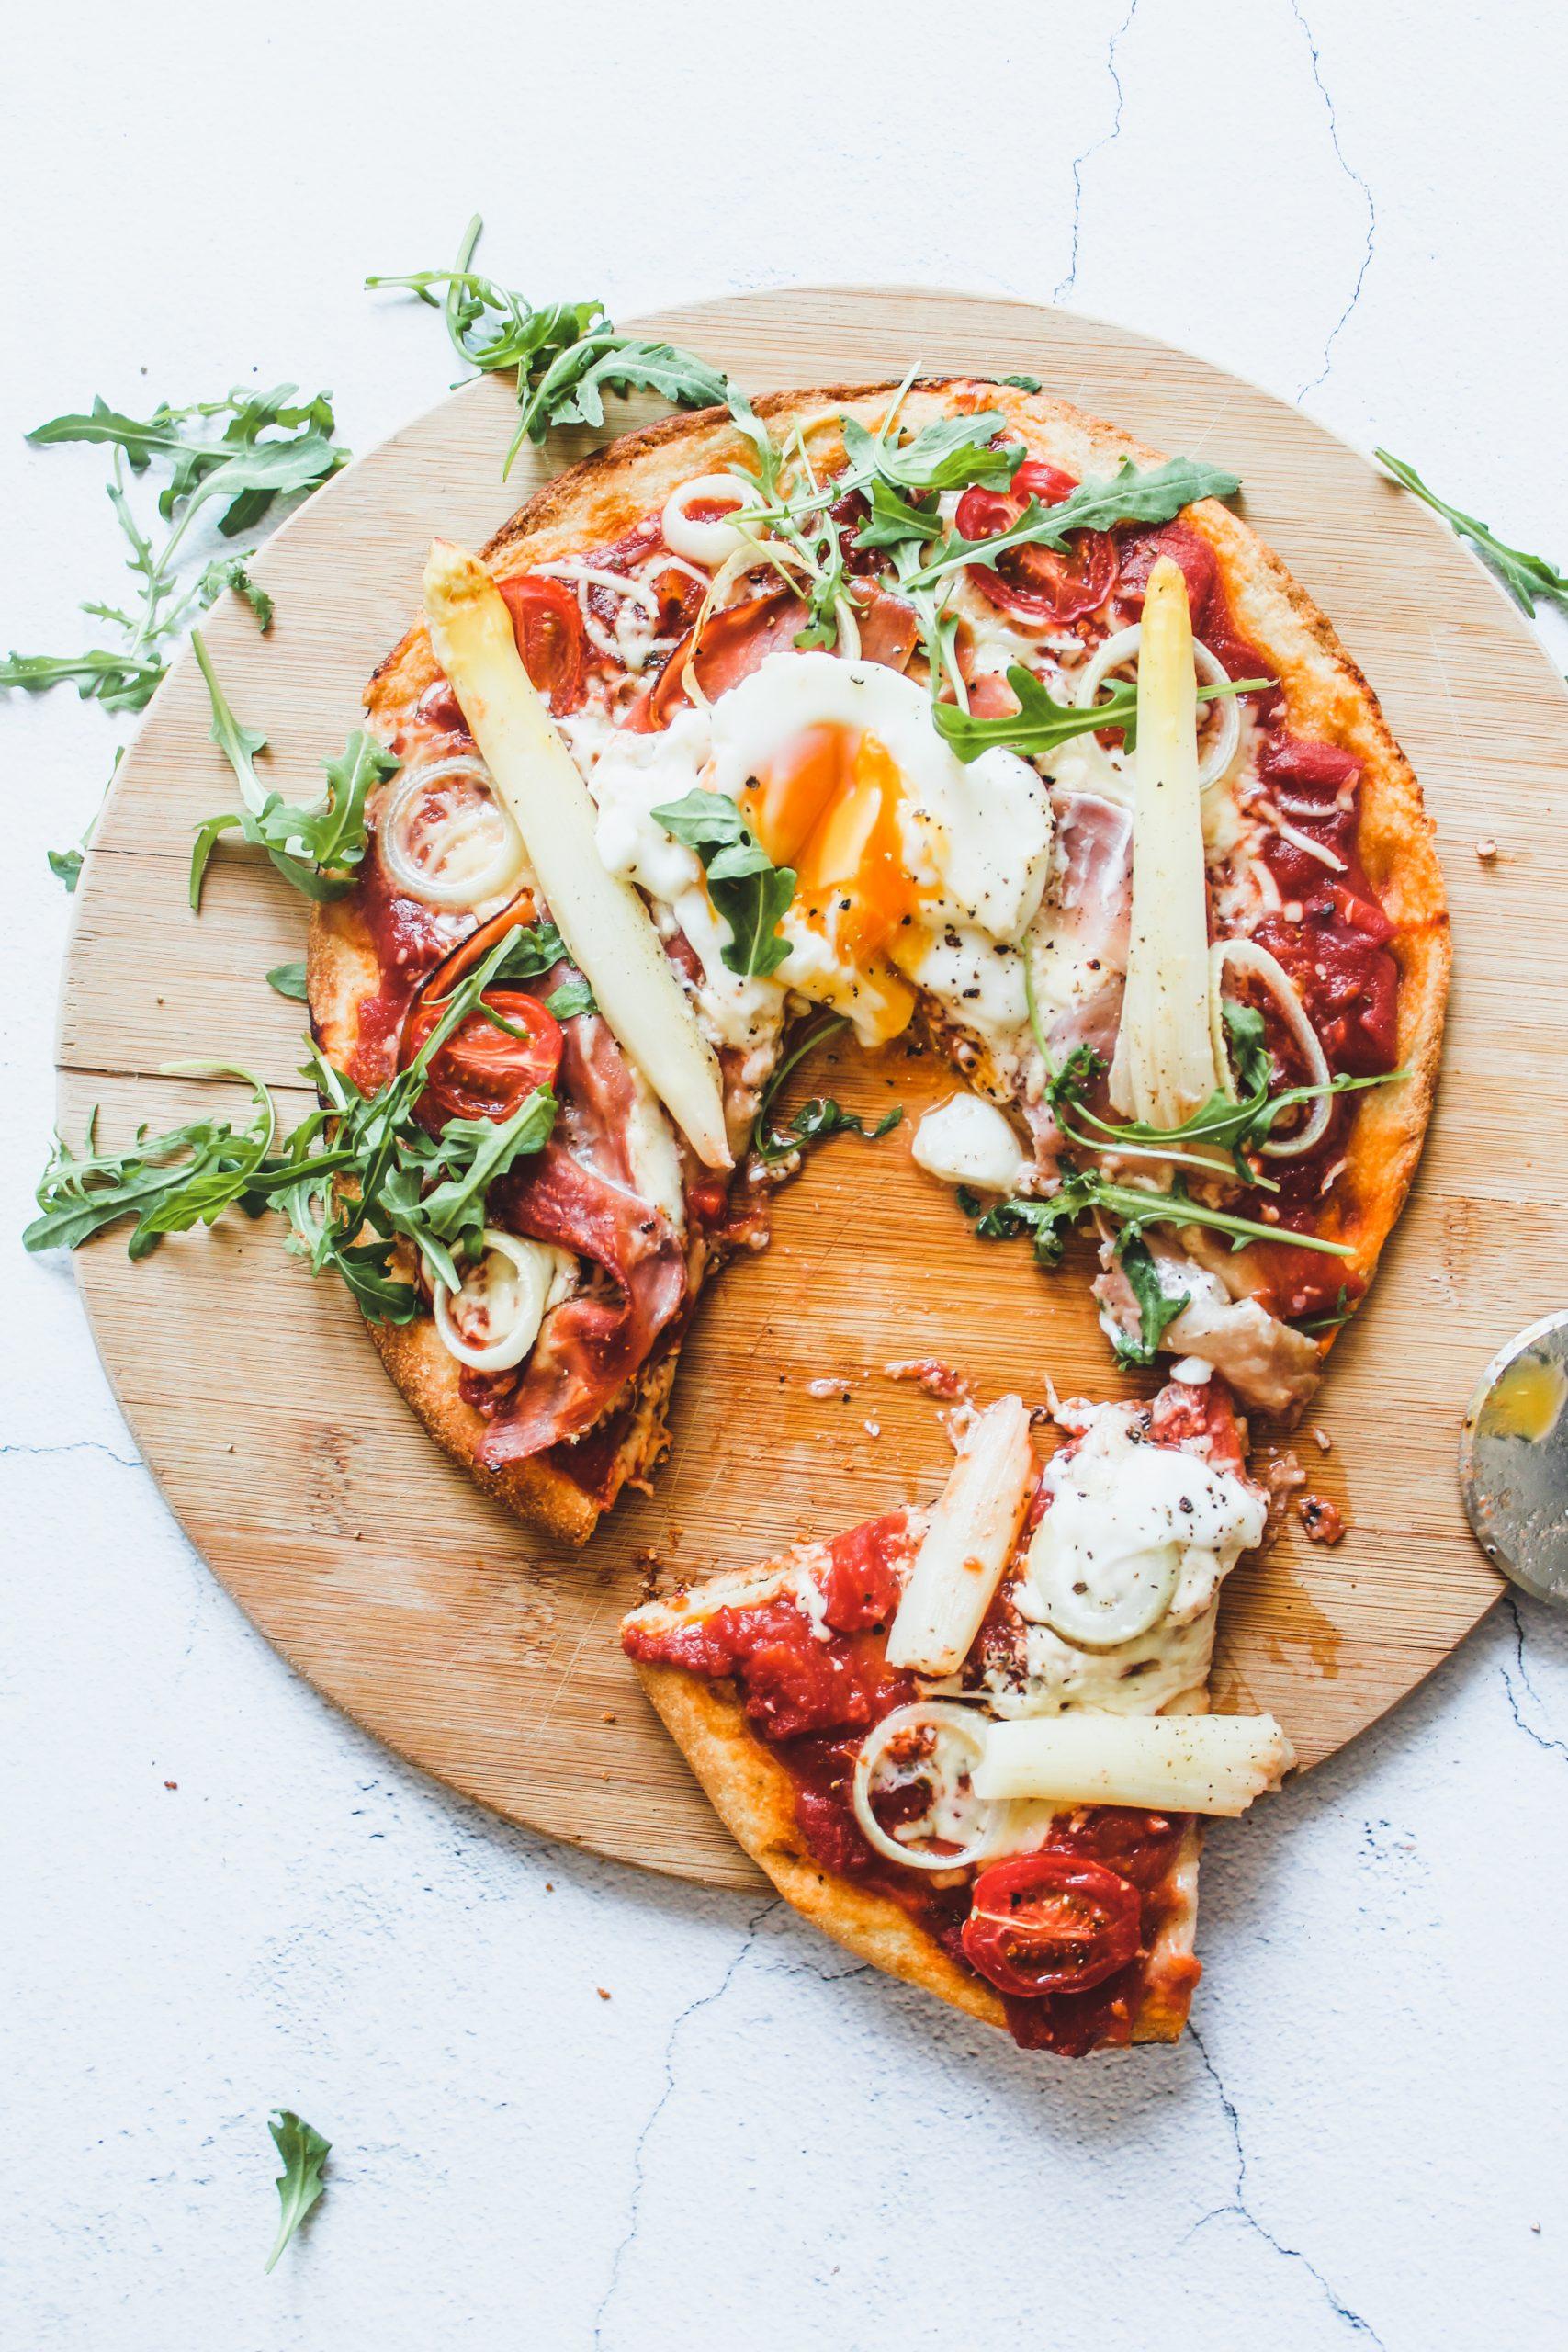 Lentepizza met witte asperges